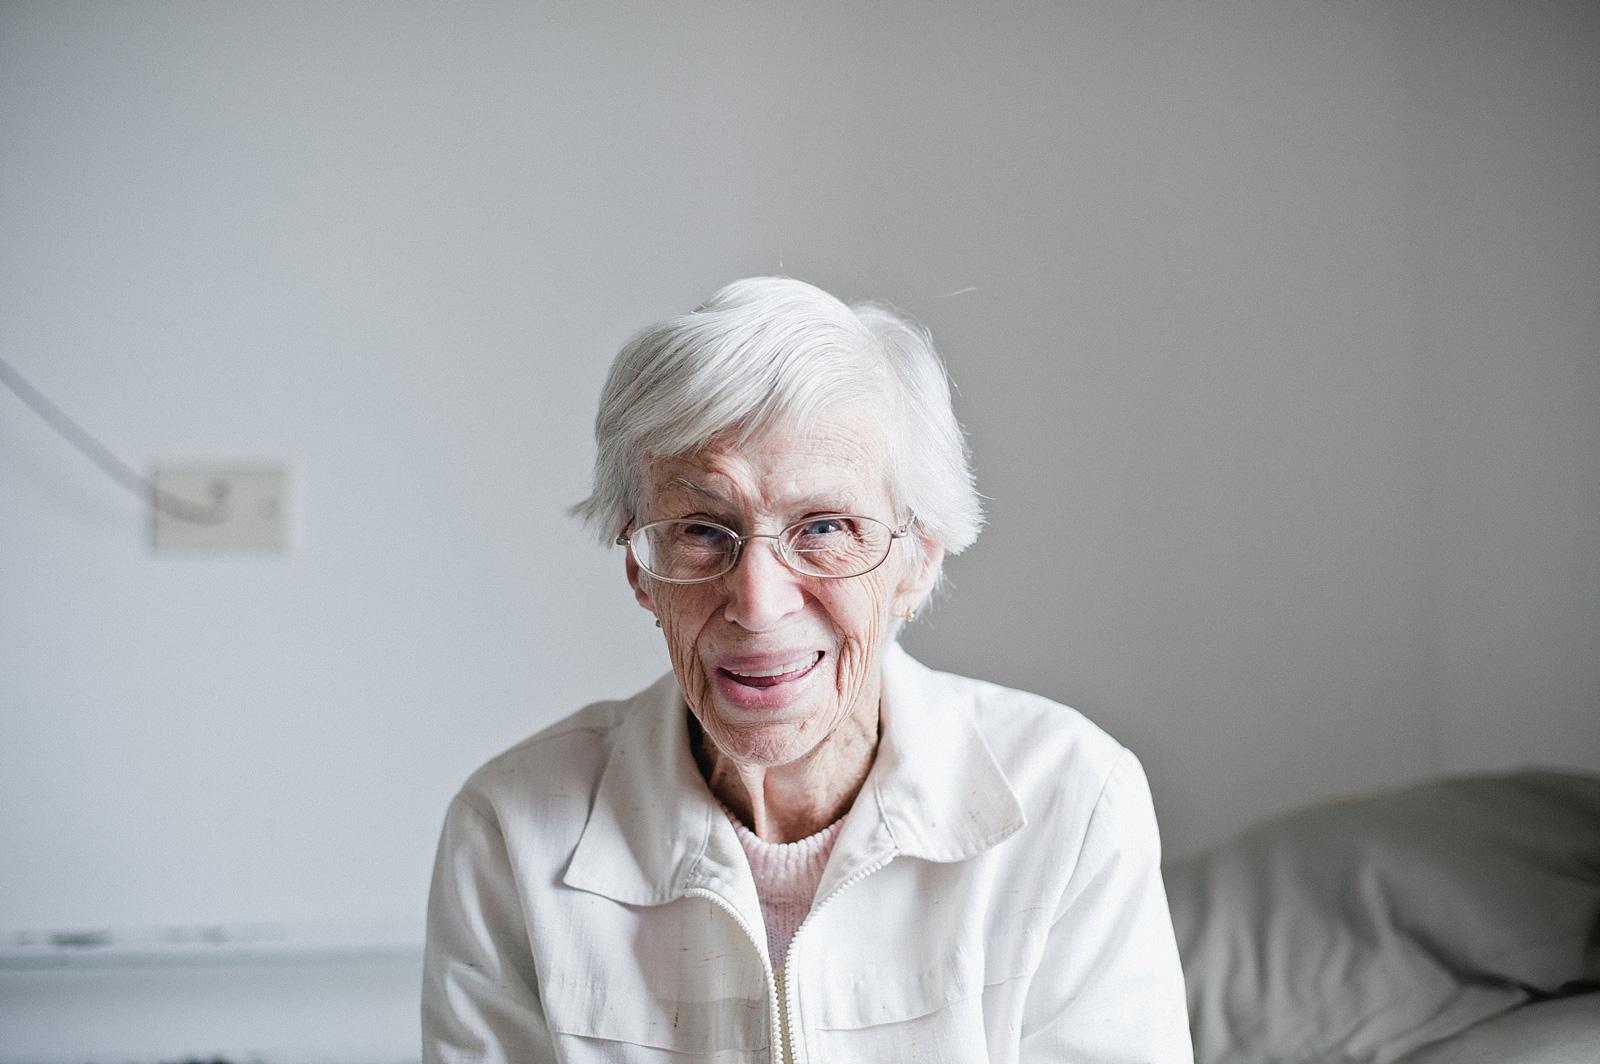 Granny-Smith-KZN-Photographer-Jacki-Bruniquel-1